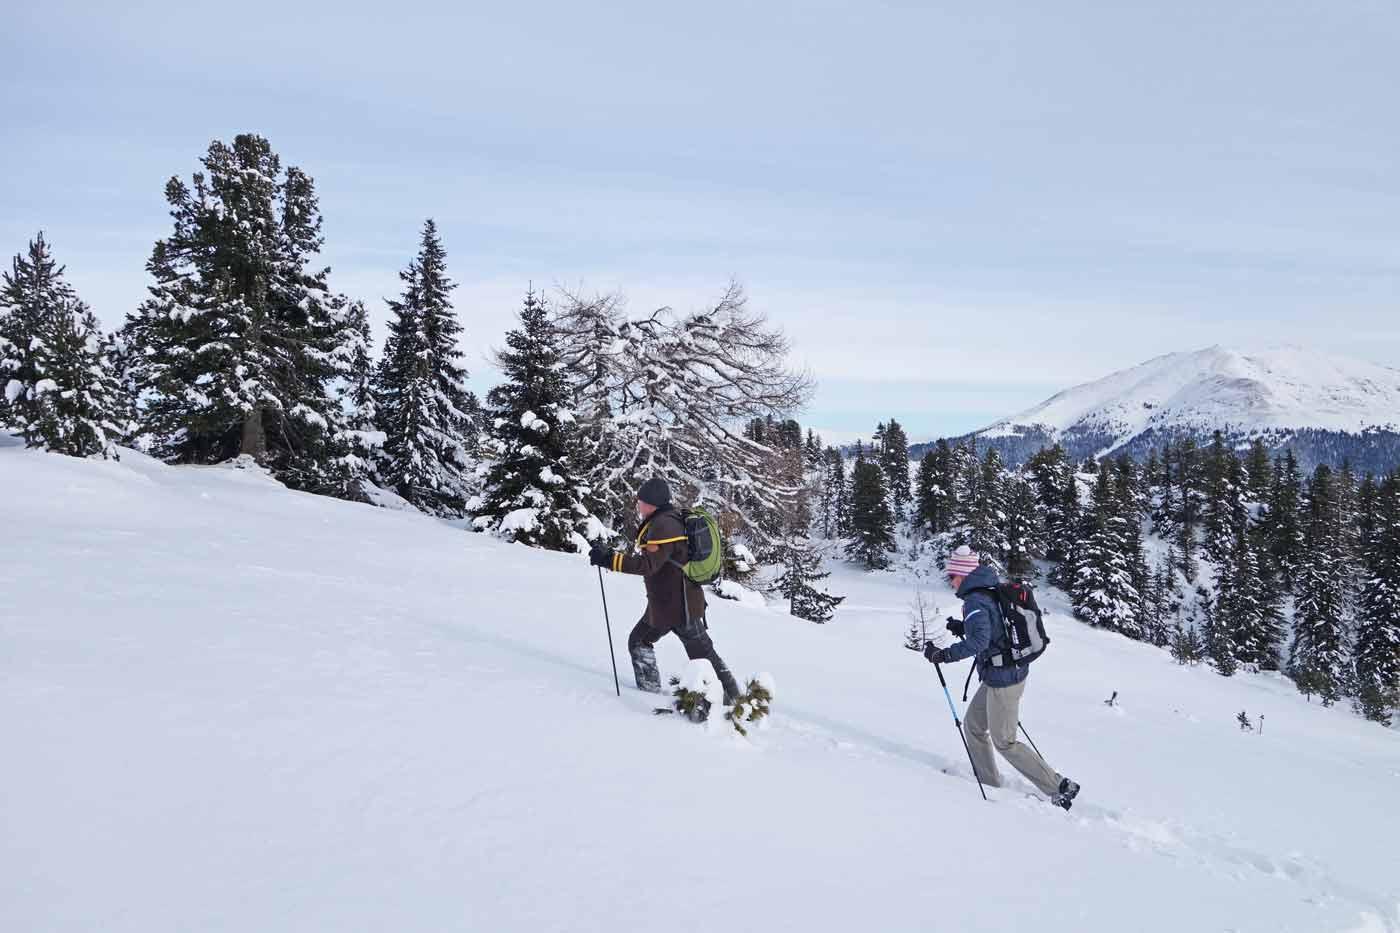 Sneeuwschoenwandelen op wintersport